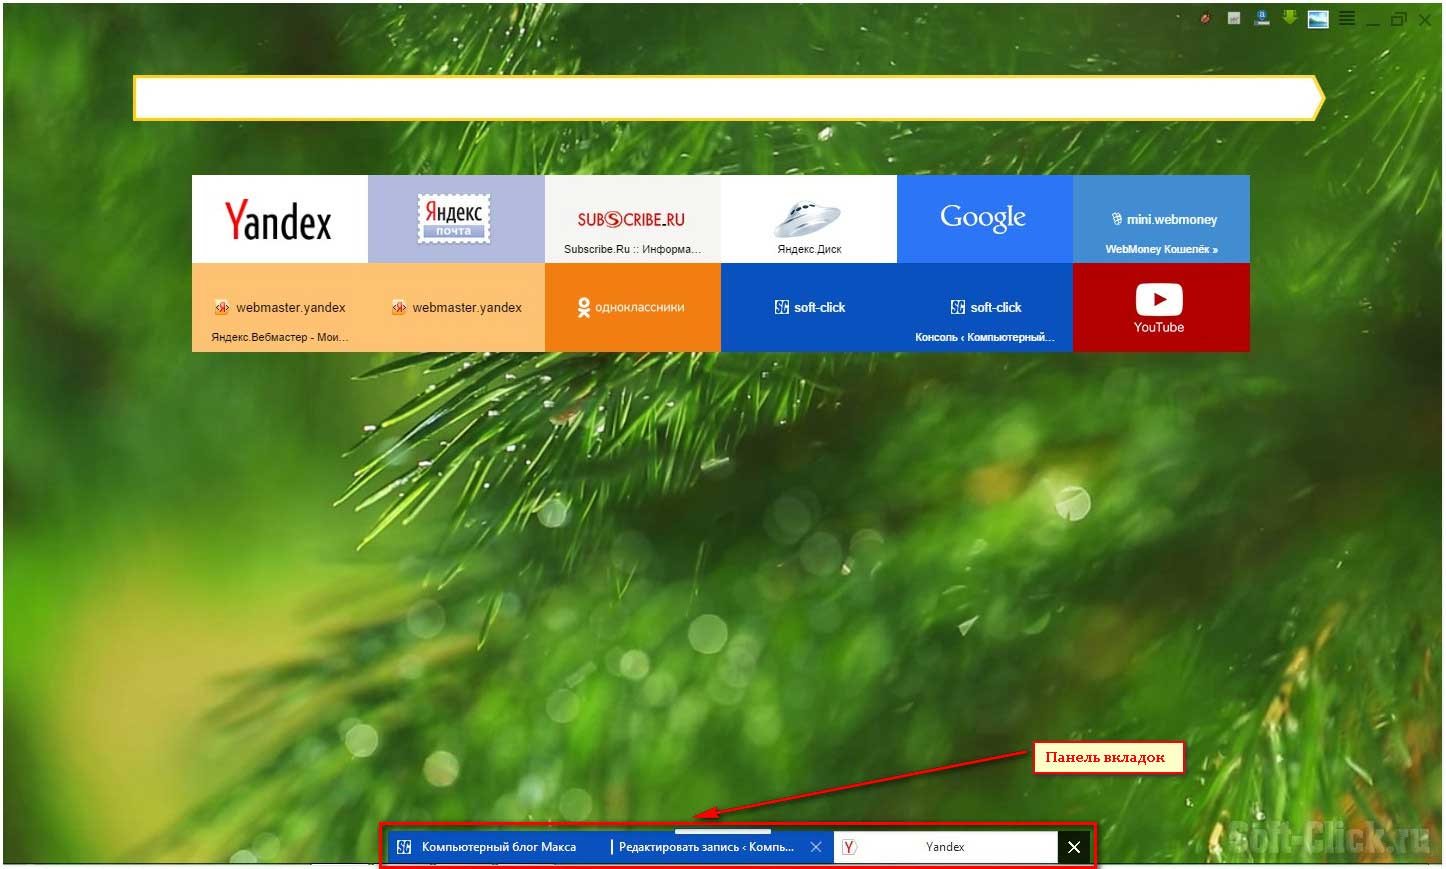 Yandex2